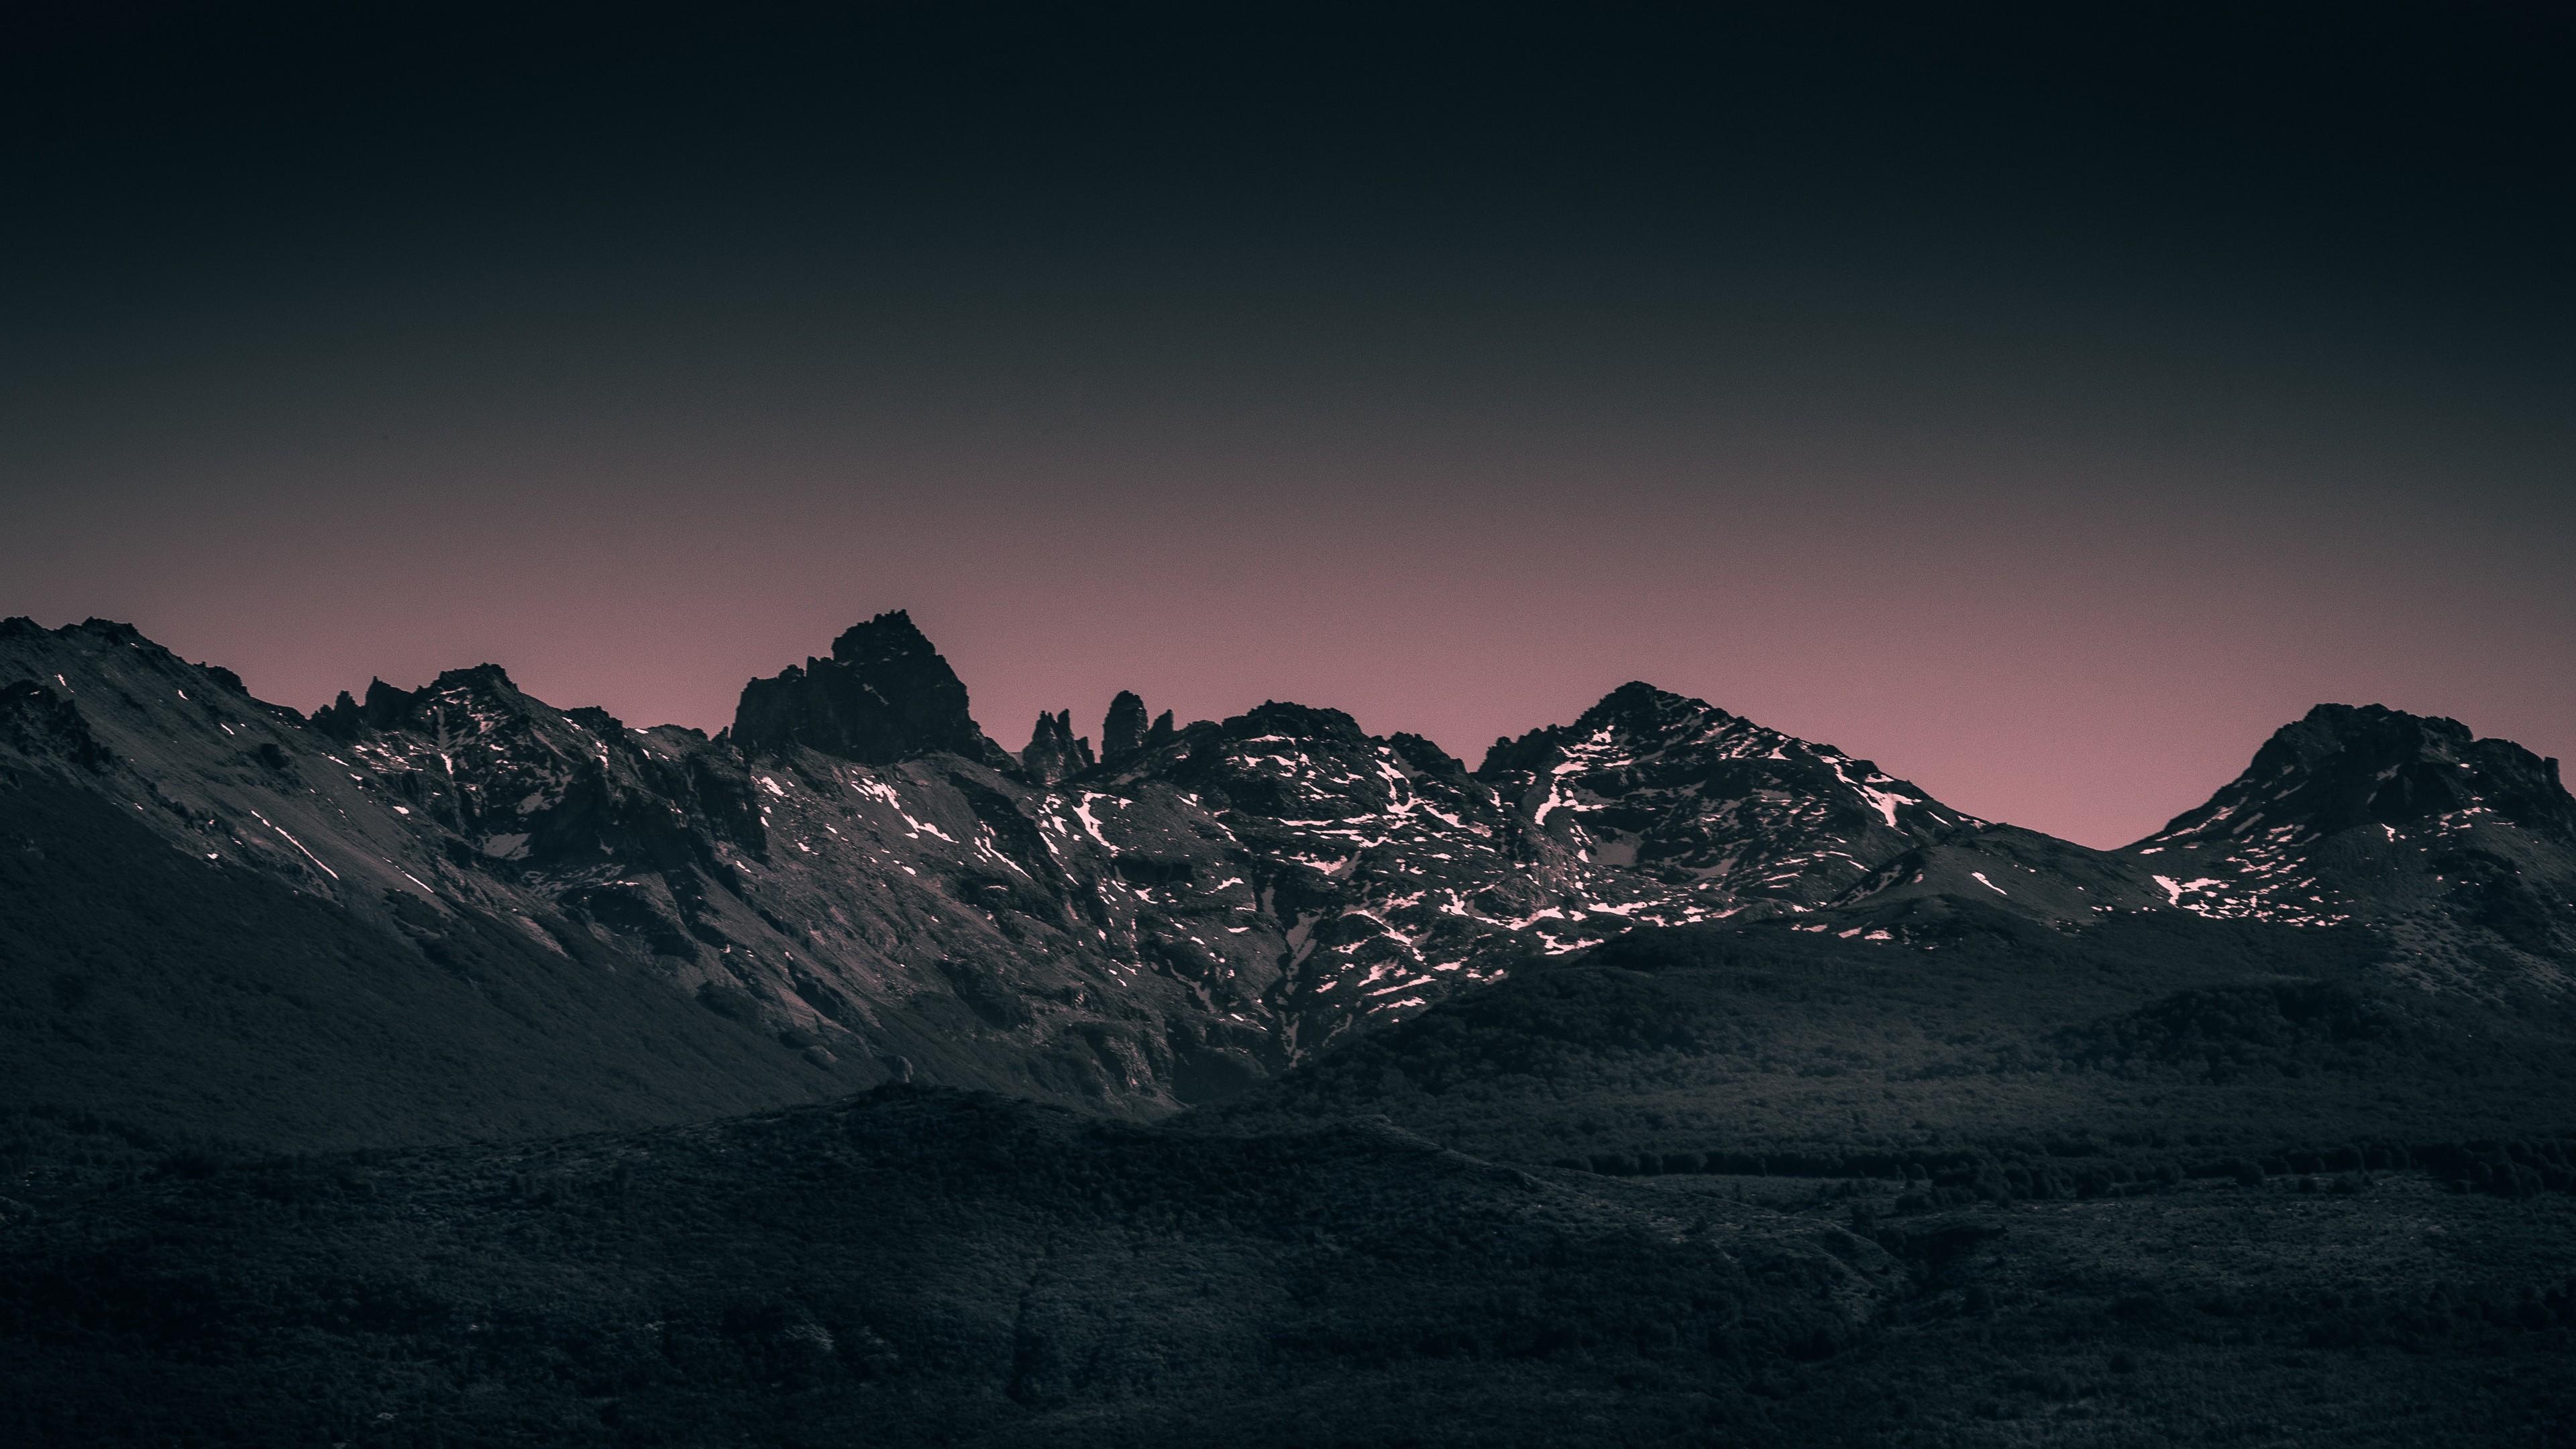 Landscape 4k Mountains 3840x2160 Download Hd Wallpaper Wallpapertip